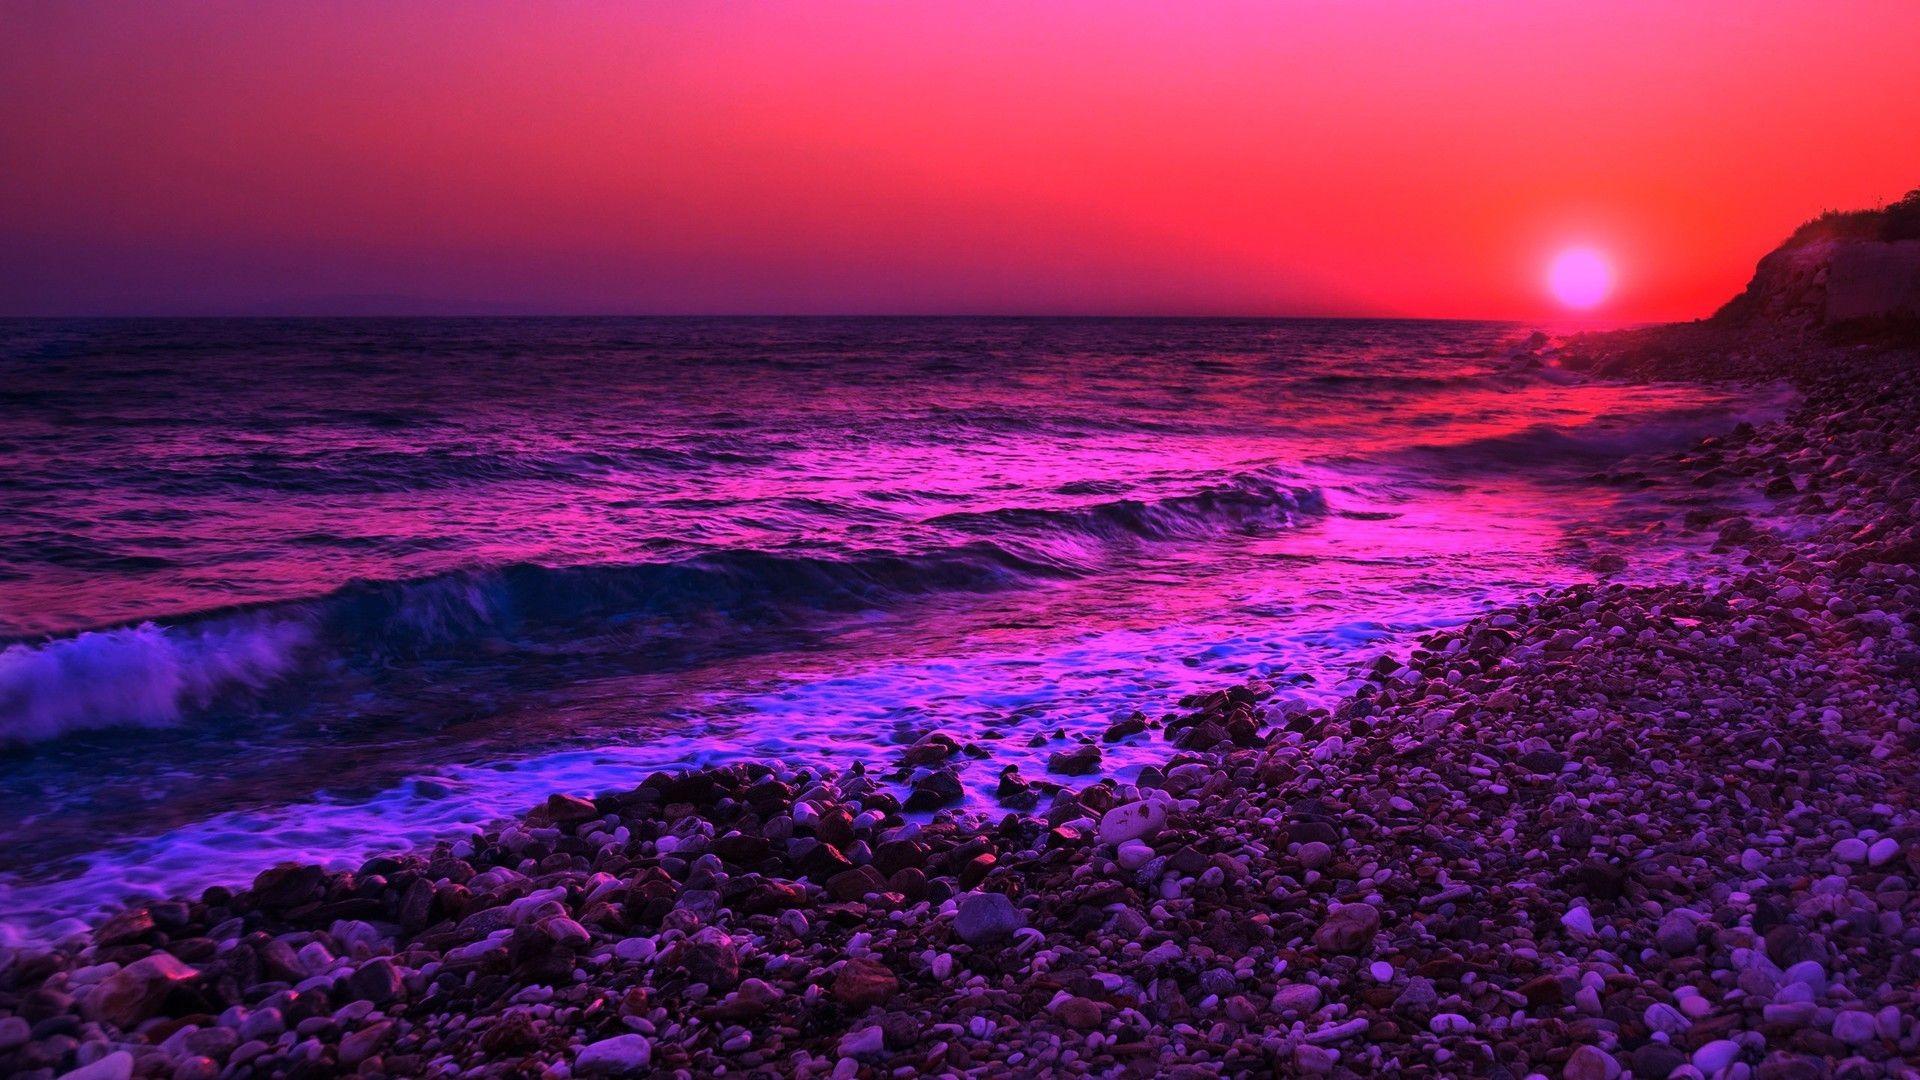 Purple Sunset computer wallpaper